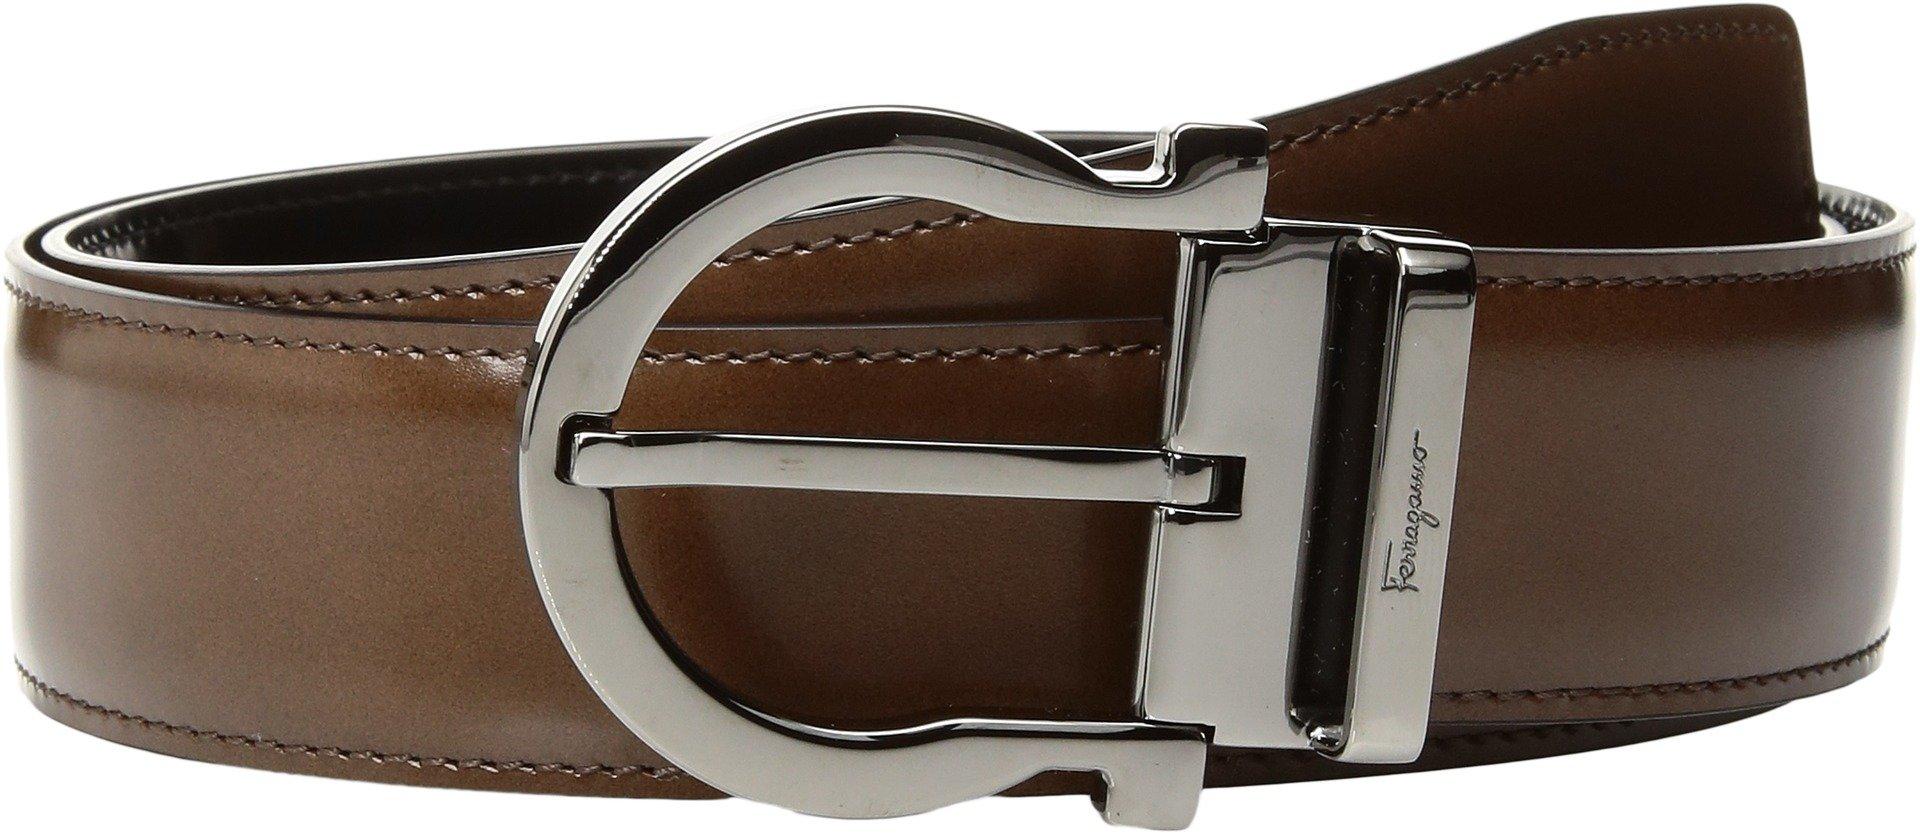 Salvatore Ferragamo Men's Single Gancini Reversible Belt, Black/Silver, 40